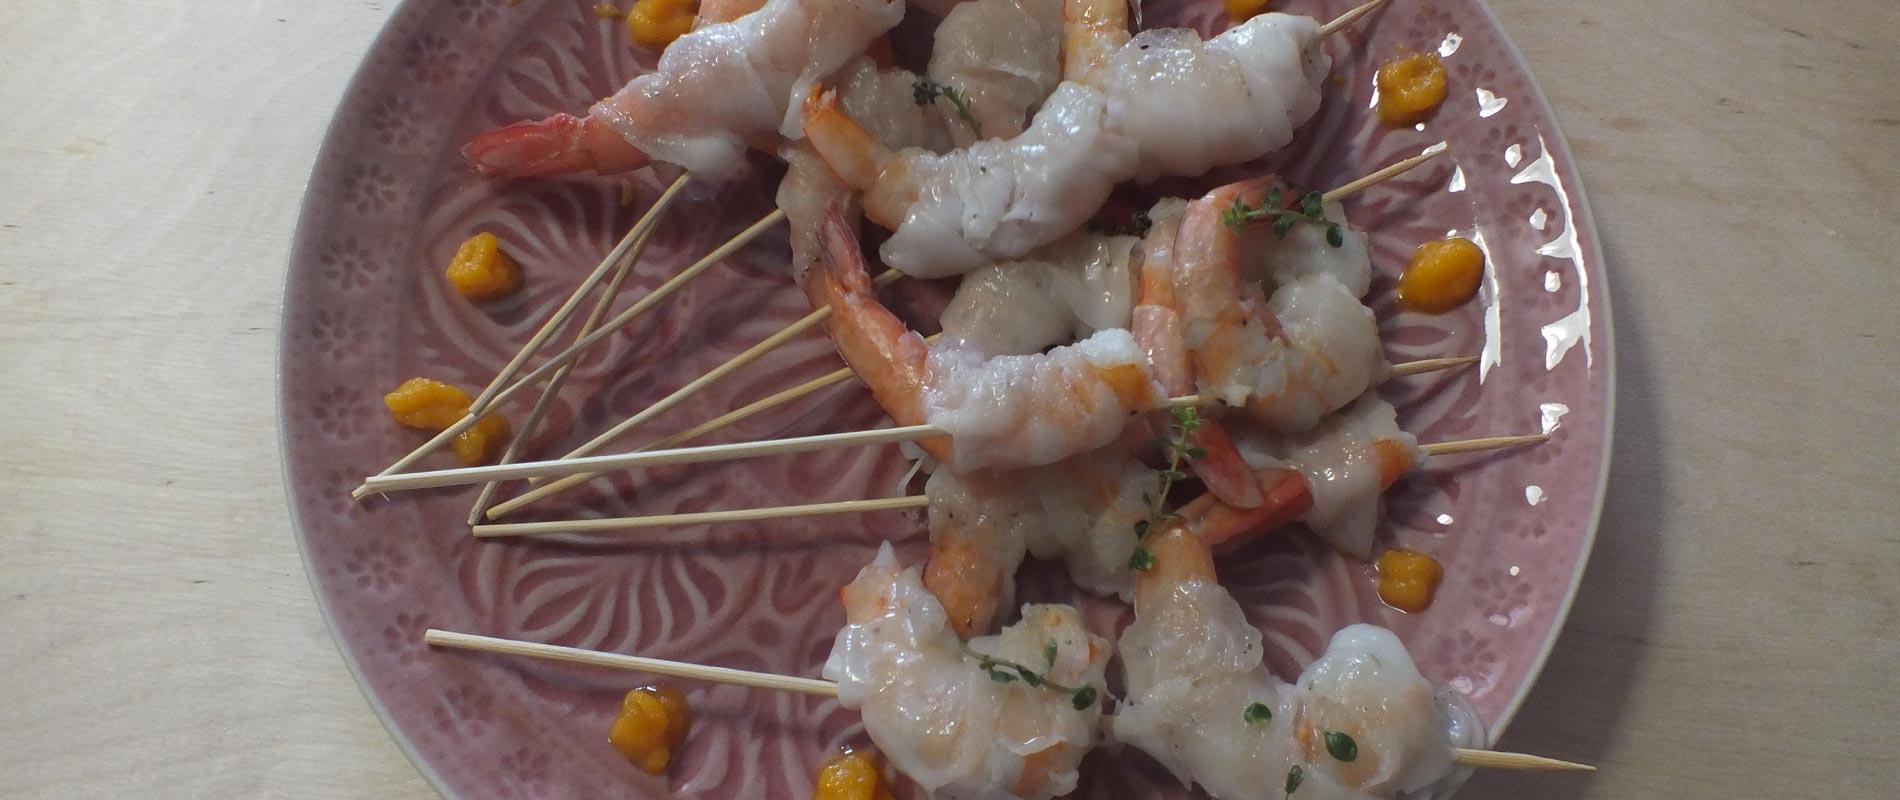 Code di gambero con lardo di cinta senese e salsa alle carote